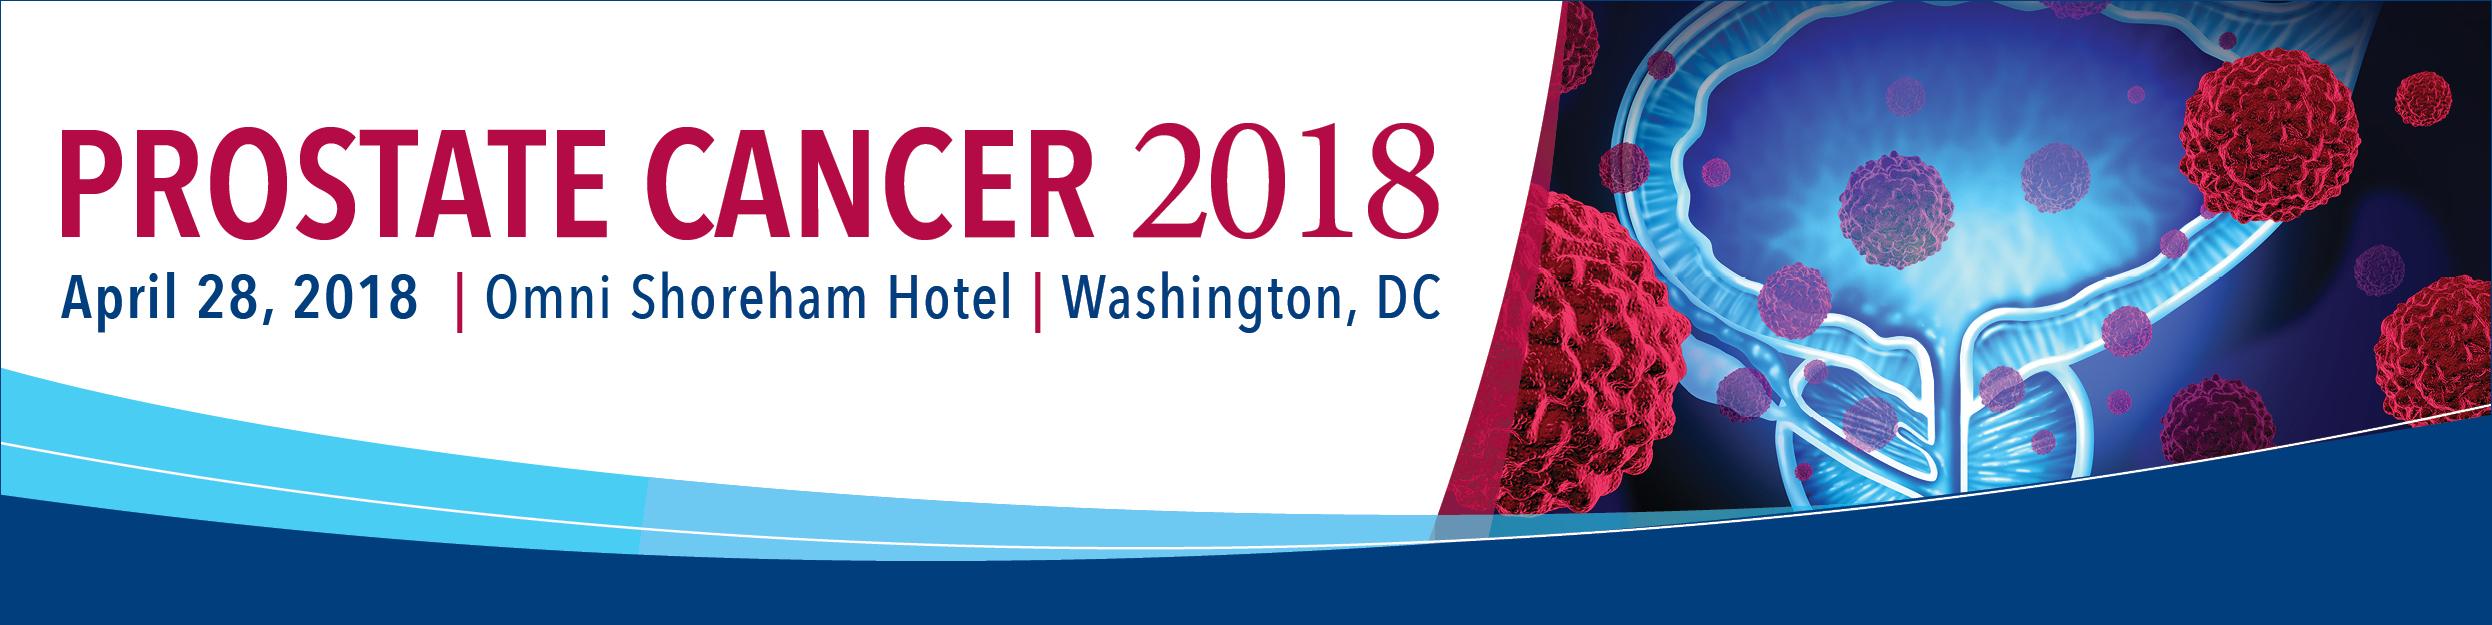 Prostate Cancer 2018 Banner